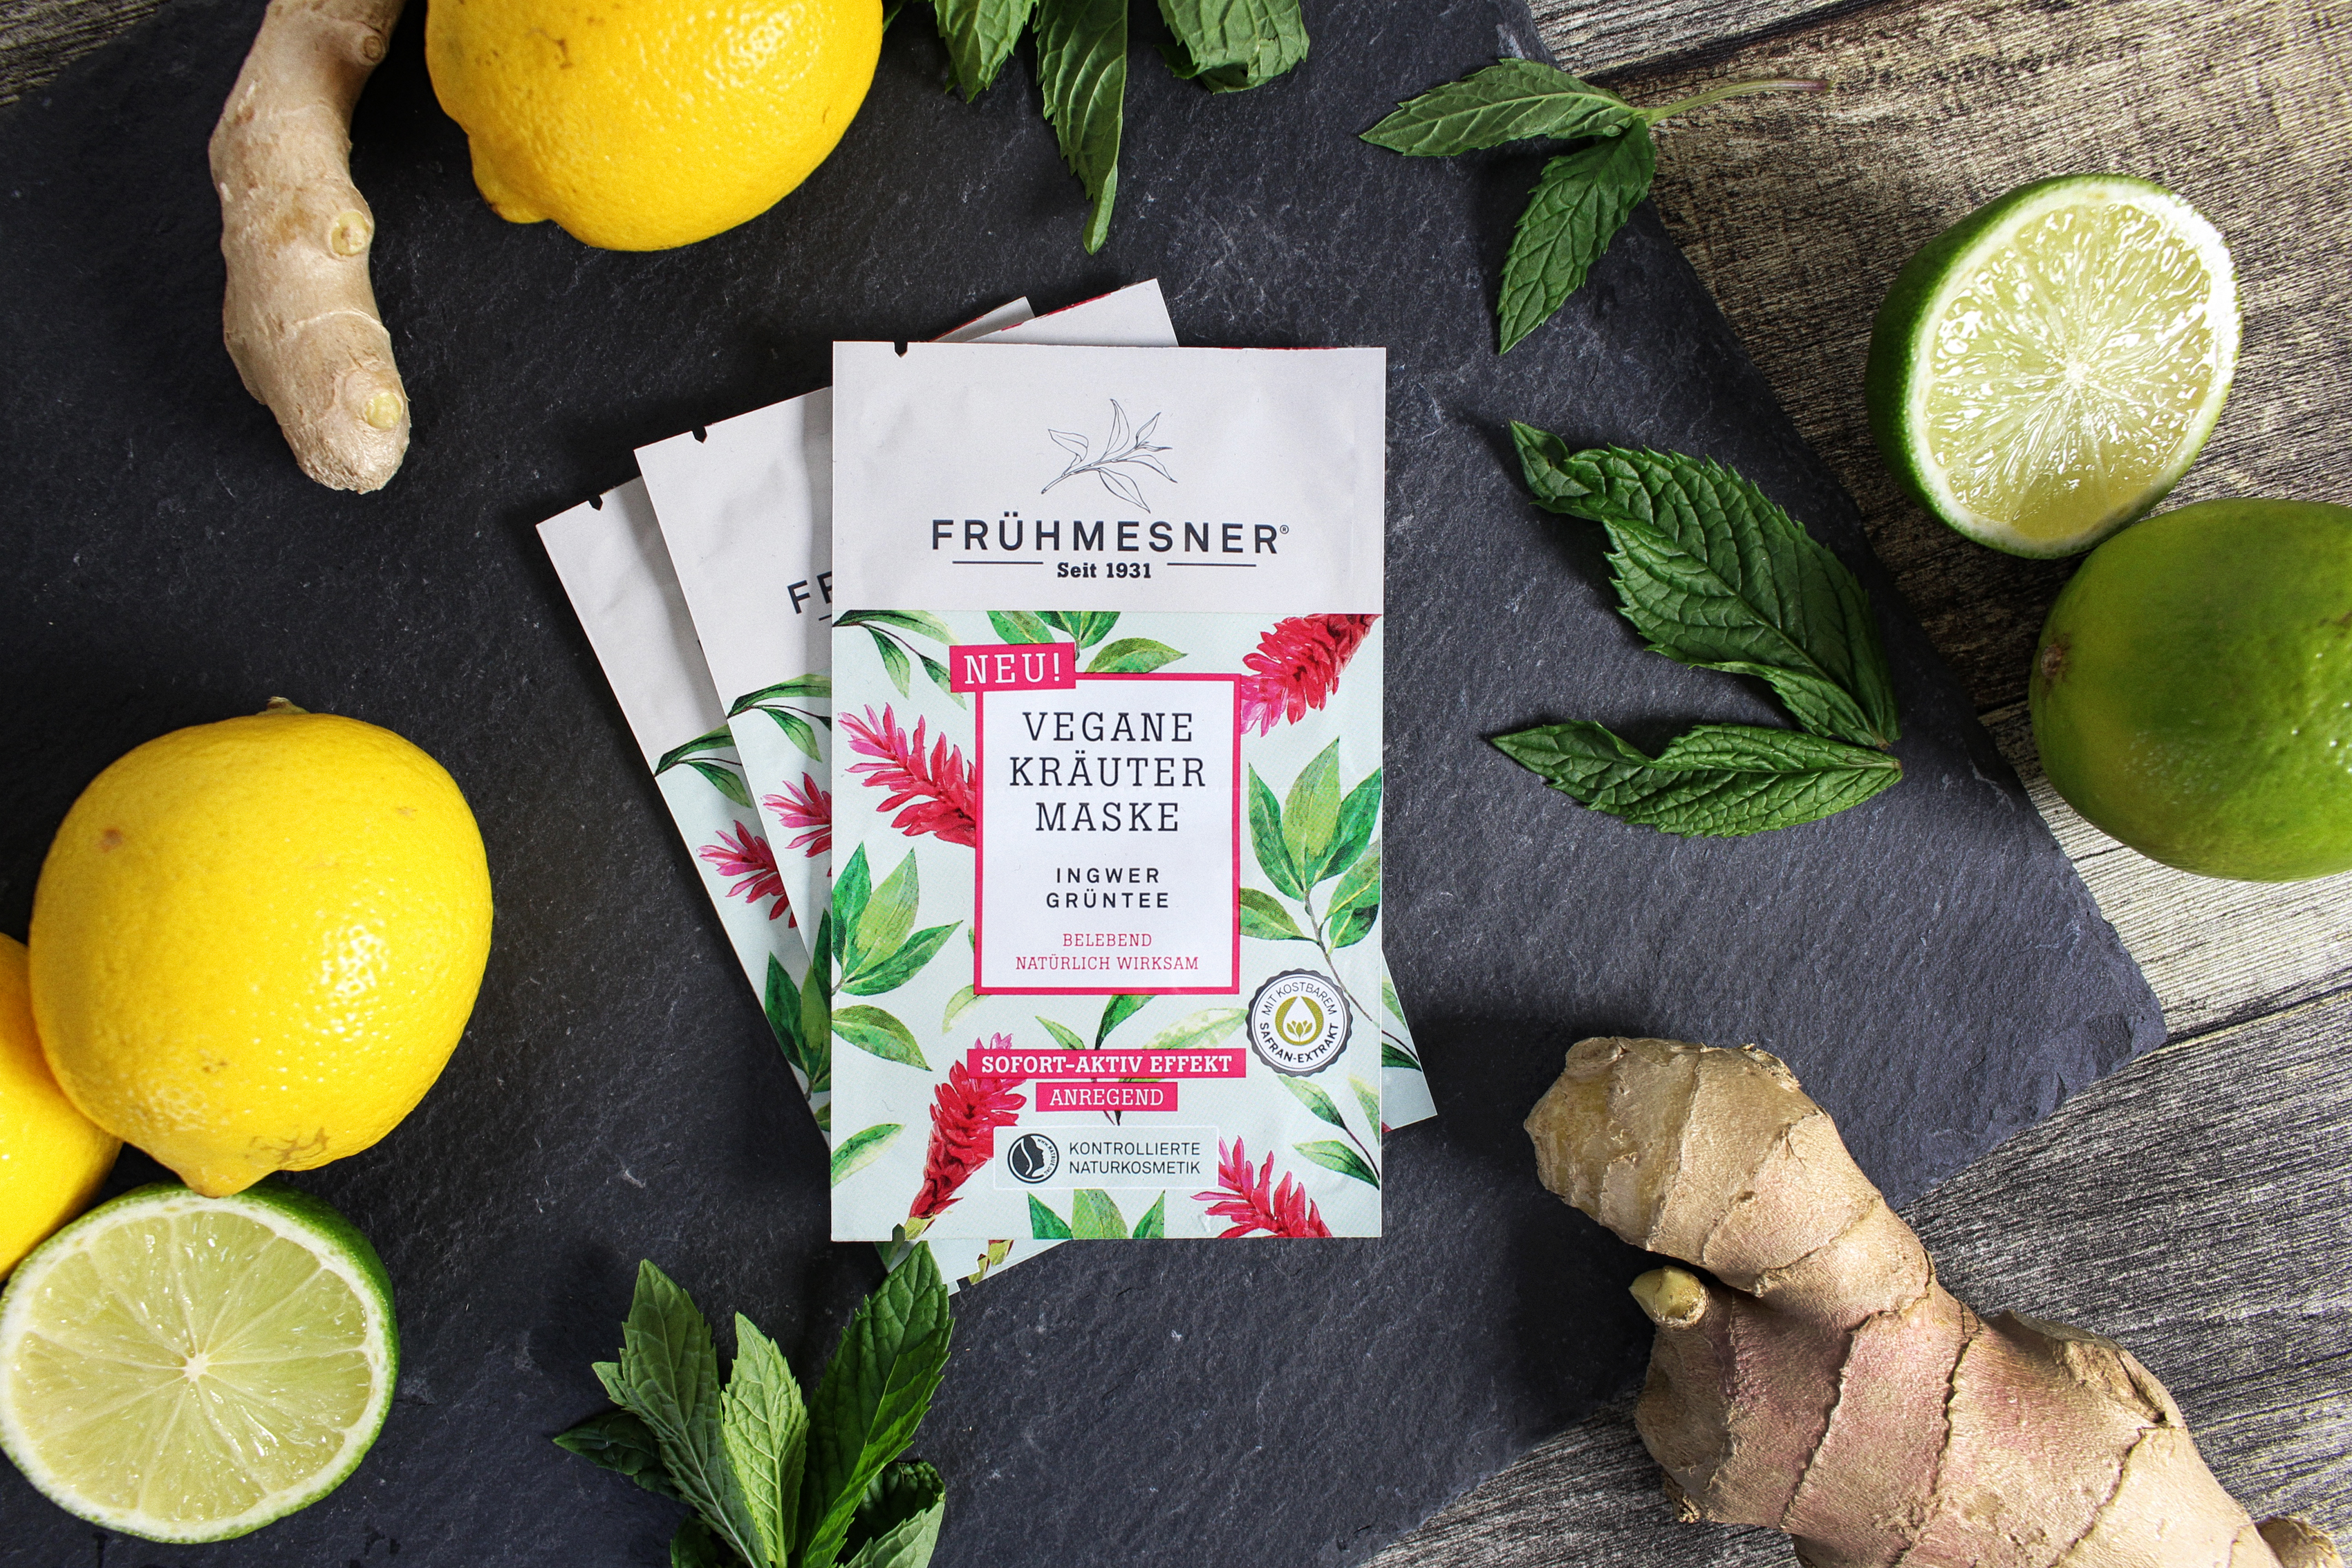 frühmesner-vegane-kräuter-maske-ingwer-grüntee-review-naturkosmetik